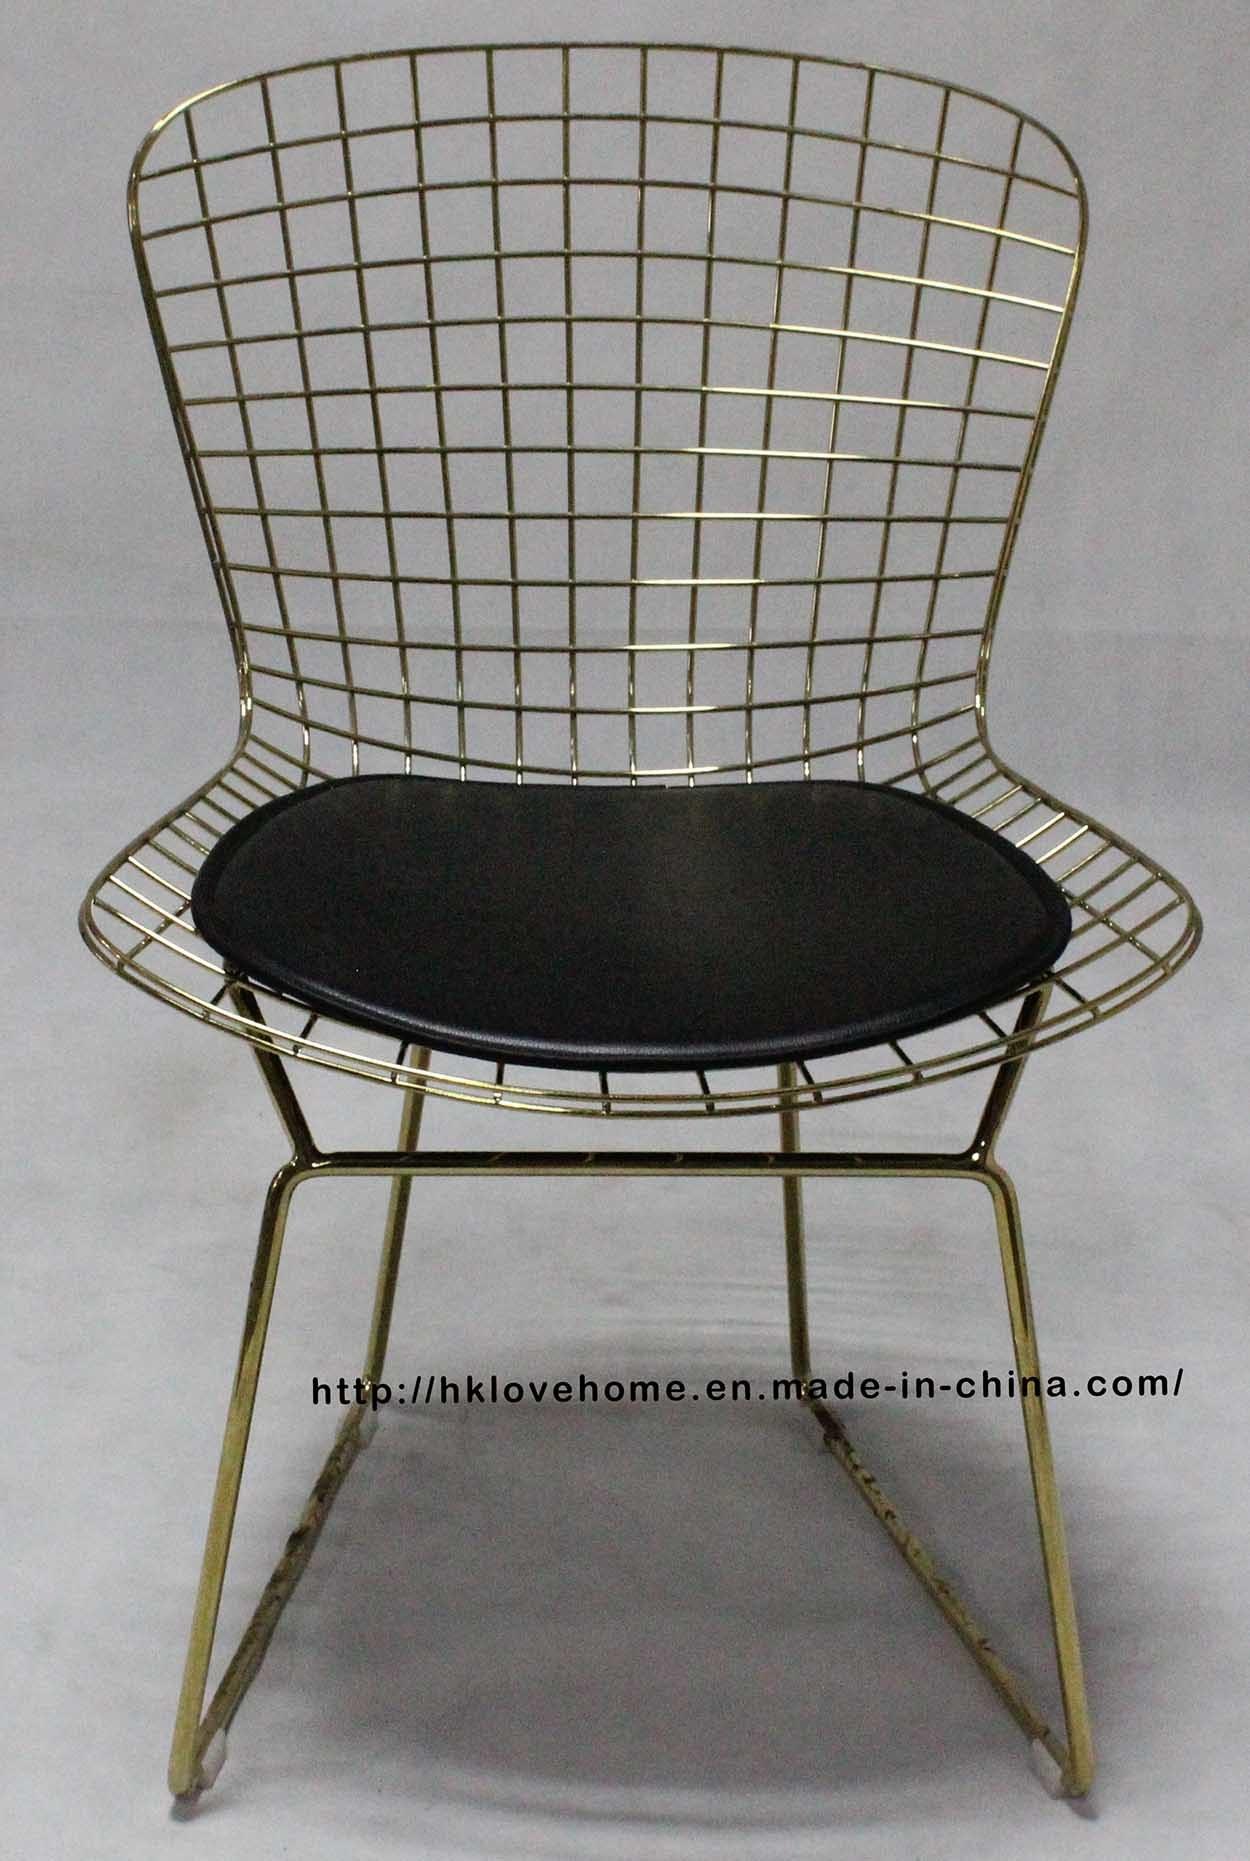 China Replica Restaurant Outdoor Furniture Metal Wire Dining Garden ...